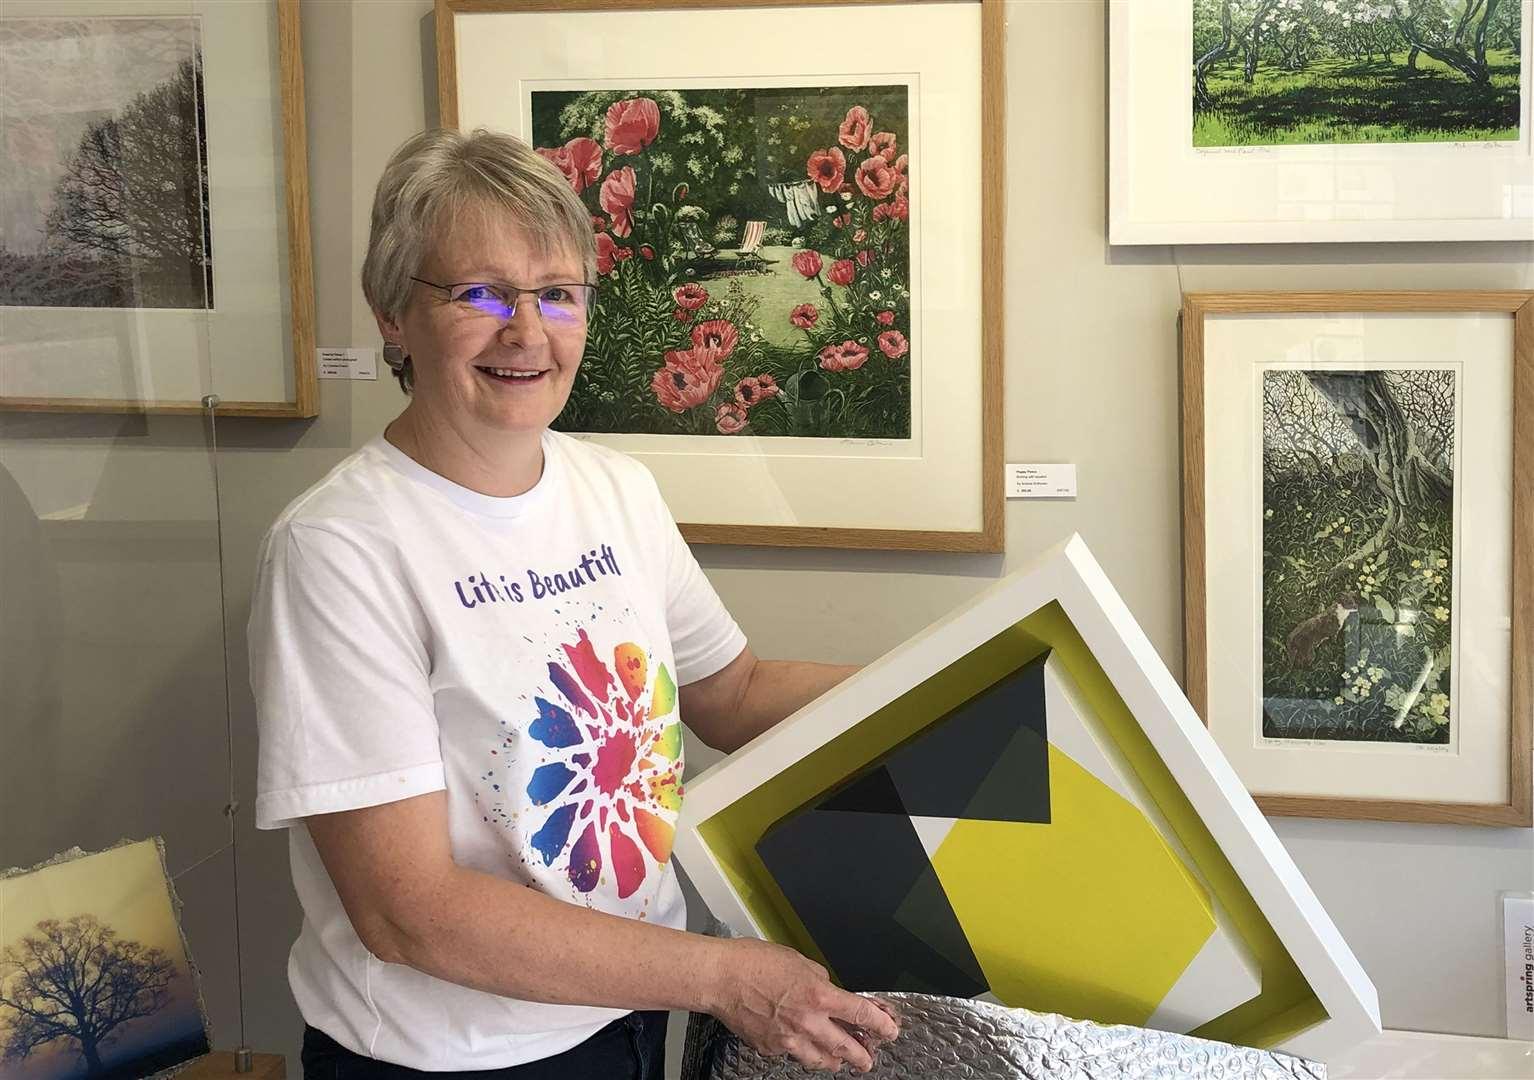 Hildegard Pax, ArtSpring Gallery manager